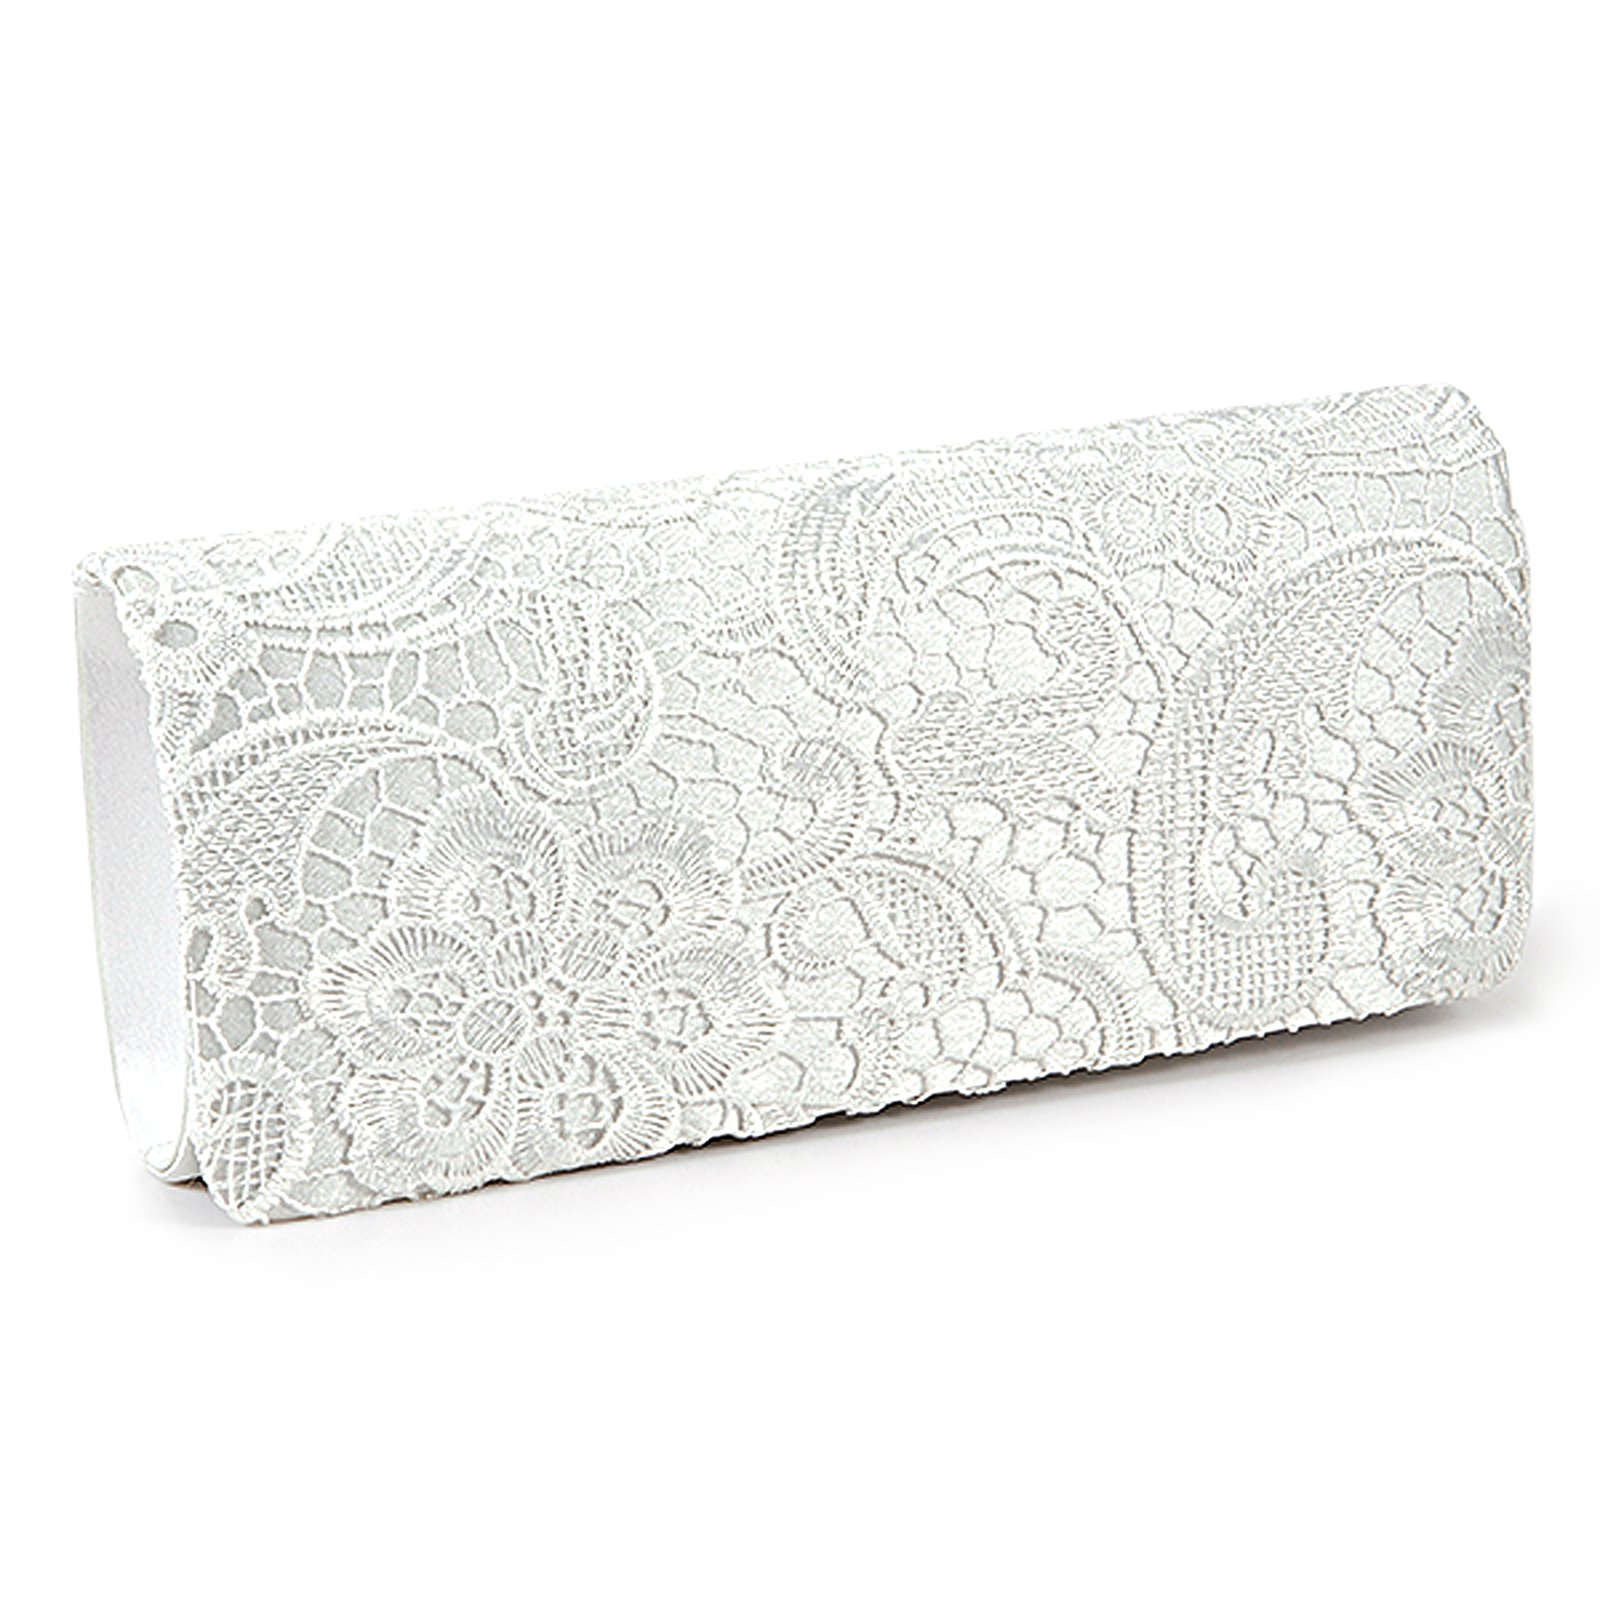 ФОТО 5pcs( ASDS bag Shoulder wallet pouch Lace Floral Style Satchel clutch Fashion for Women Girl White